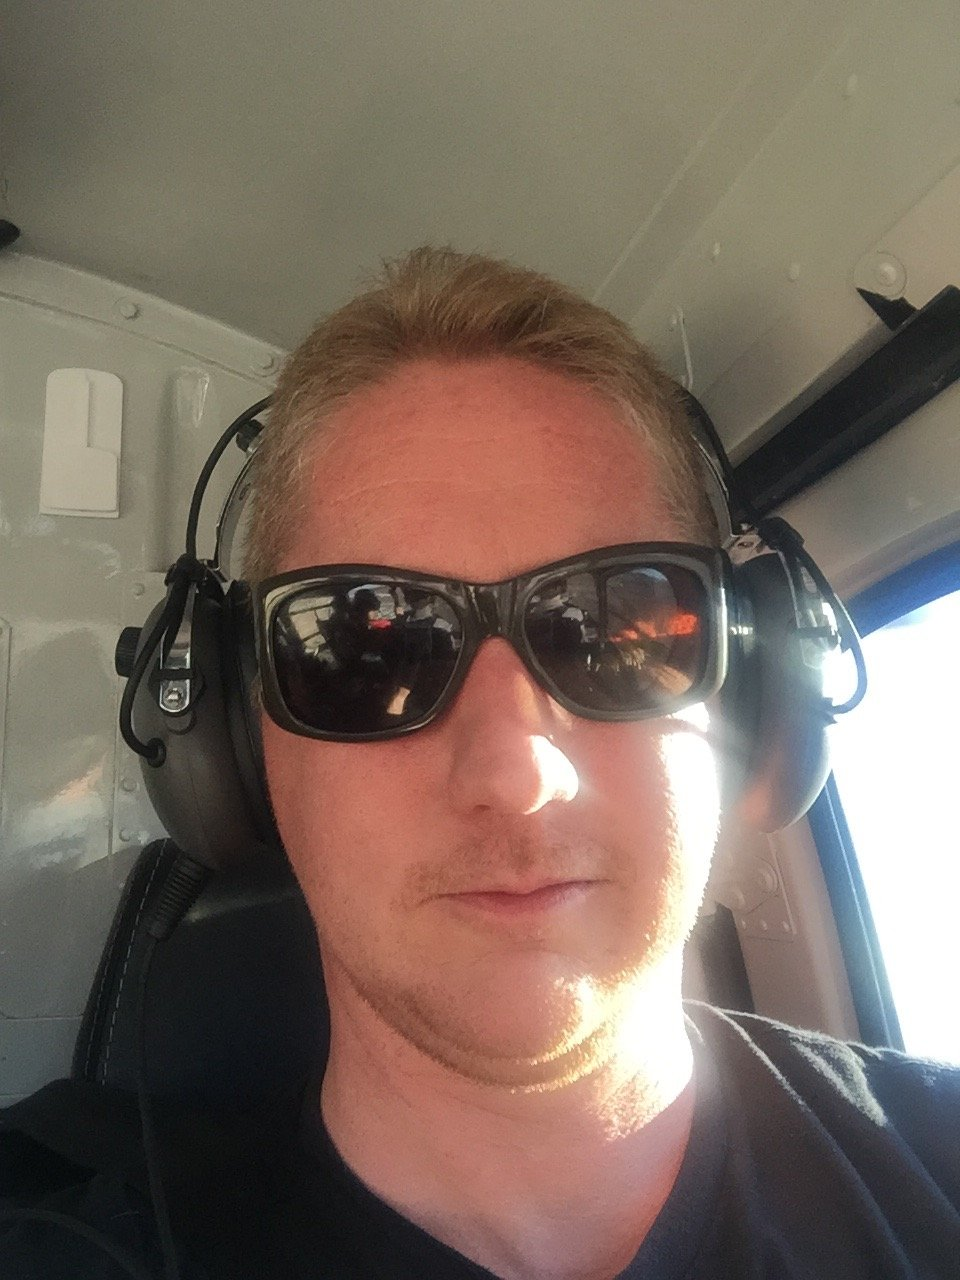 man with a van Edinburgh wearing sunglasses taking a selfie